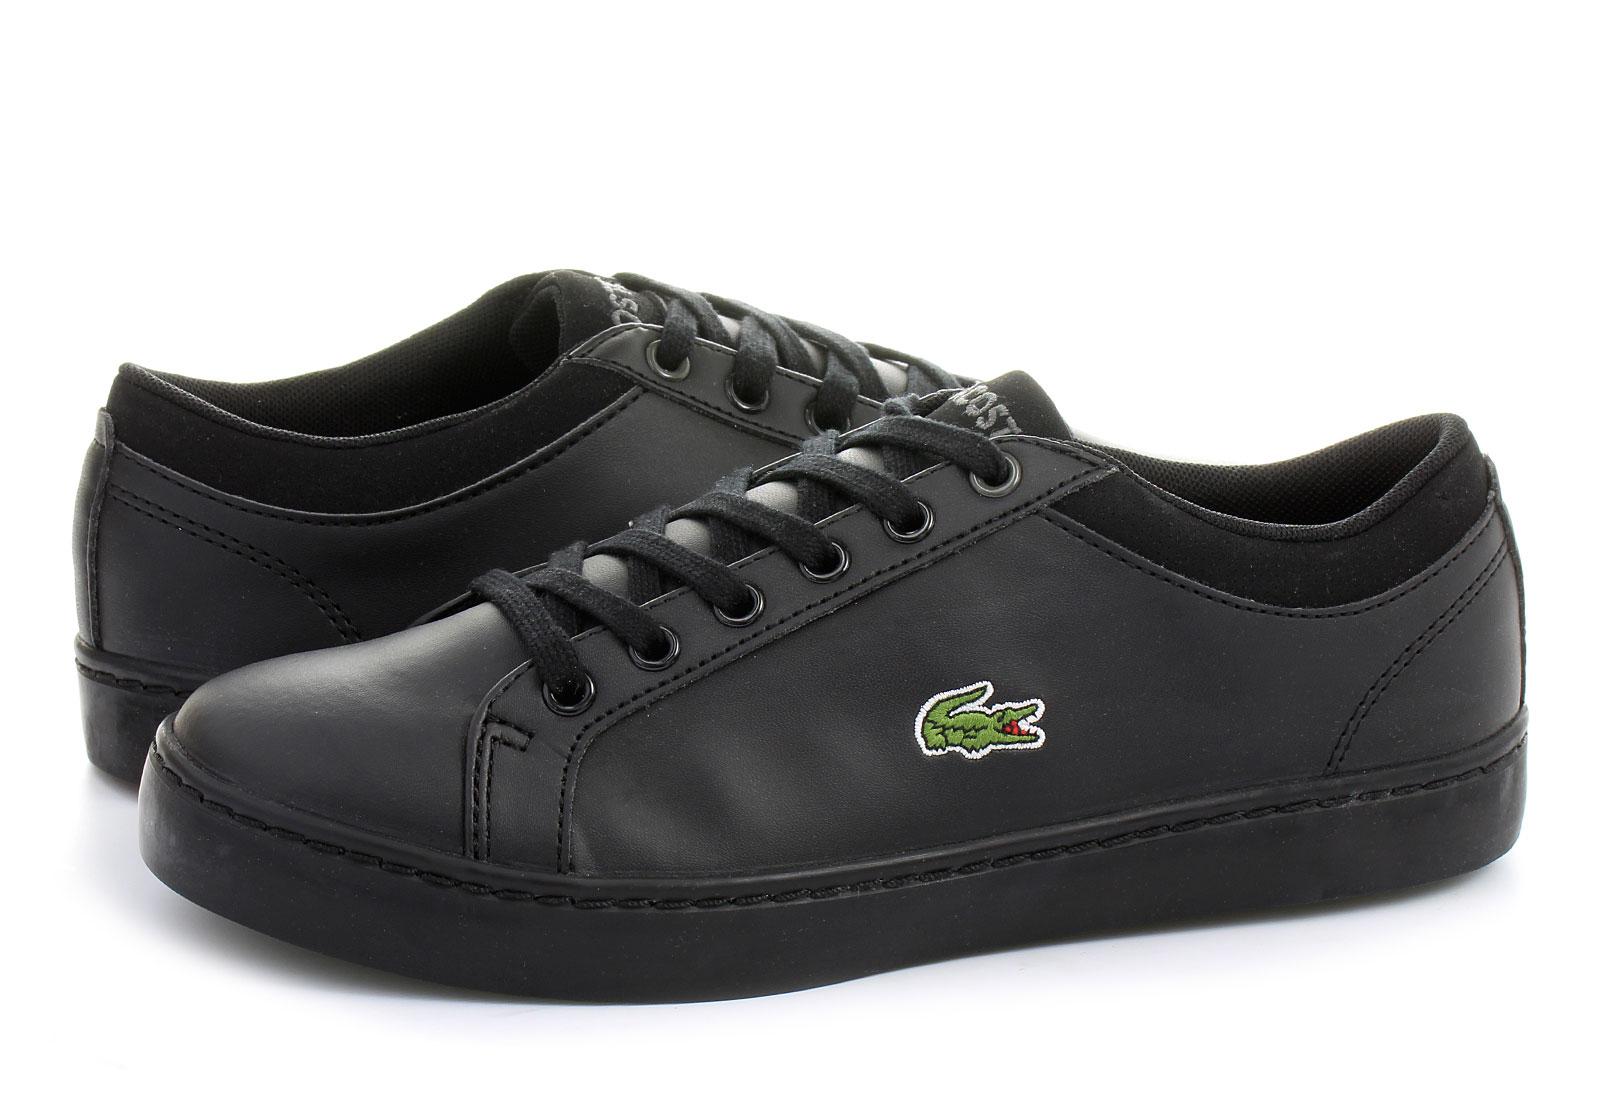 Lacoste Shoes - Straightset Lace 1 - 163spj0103-024 - Online shop ... 0747786baa